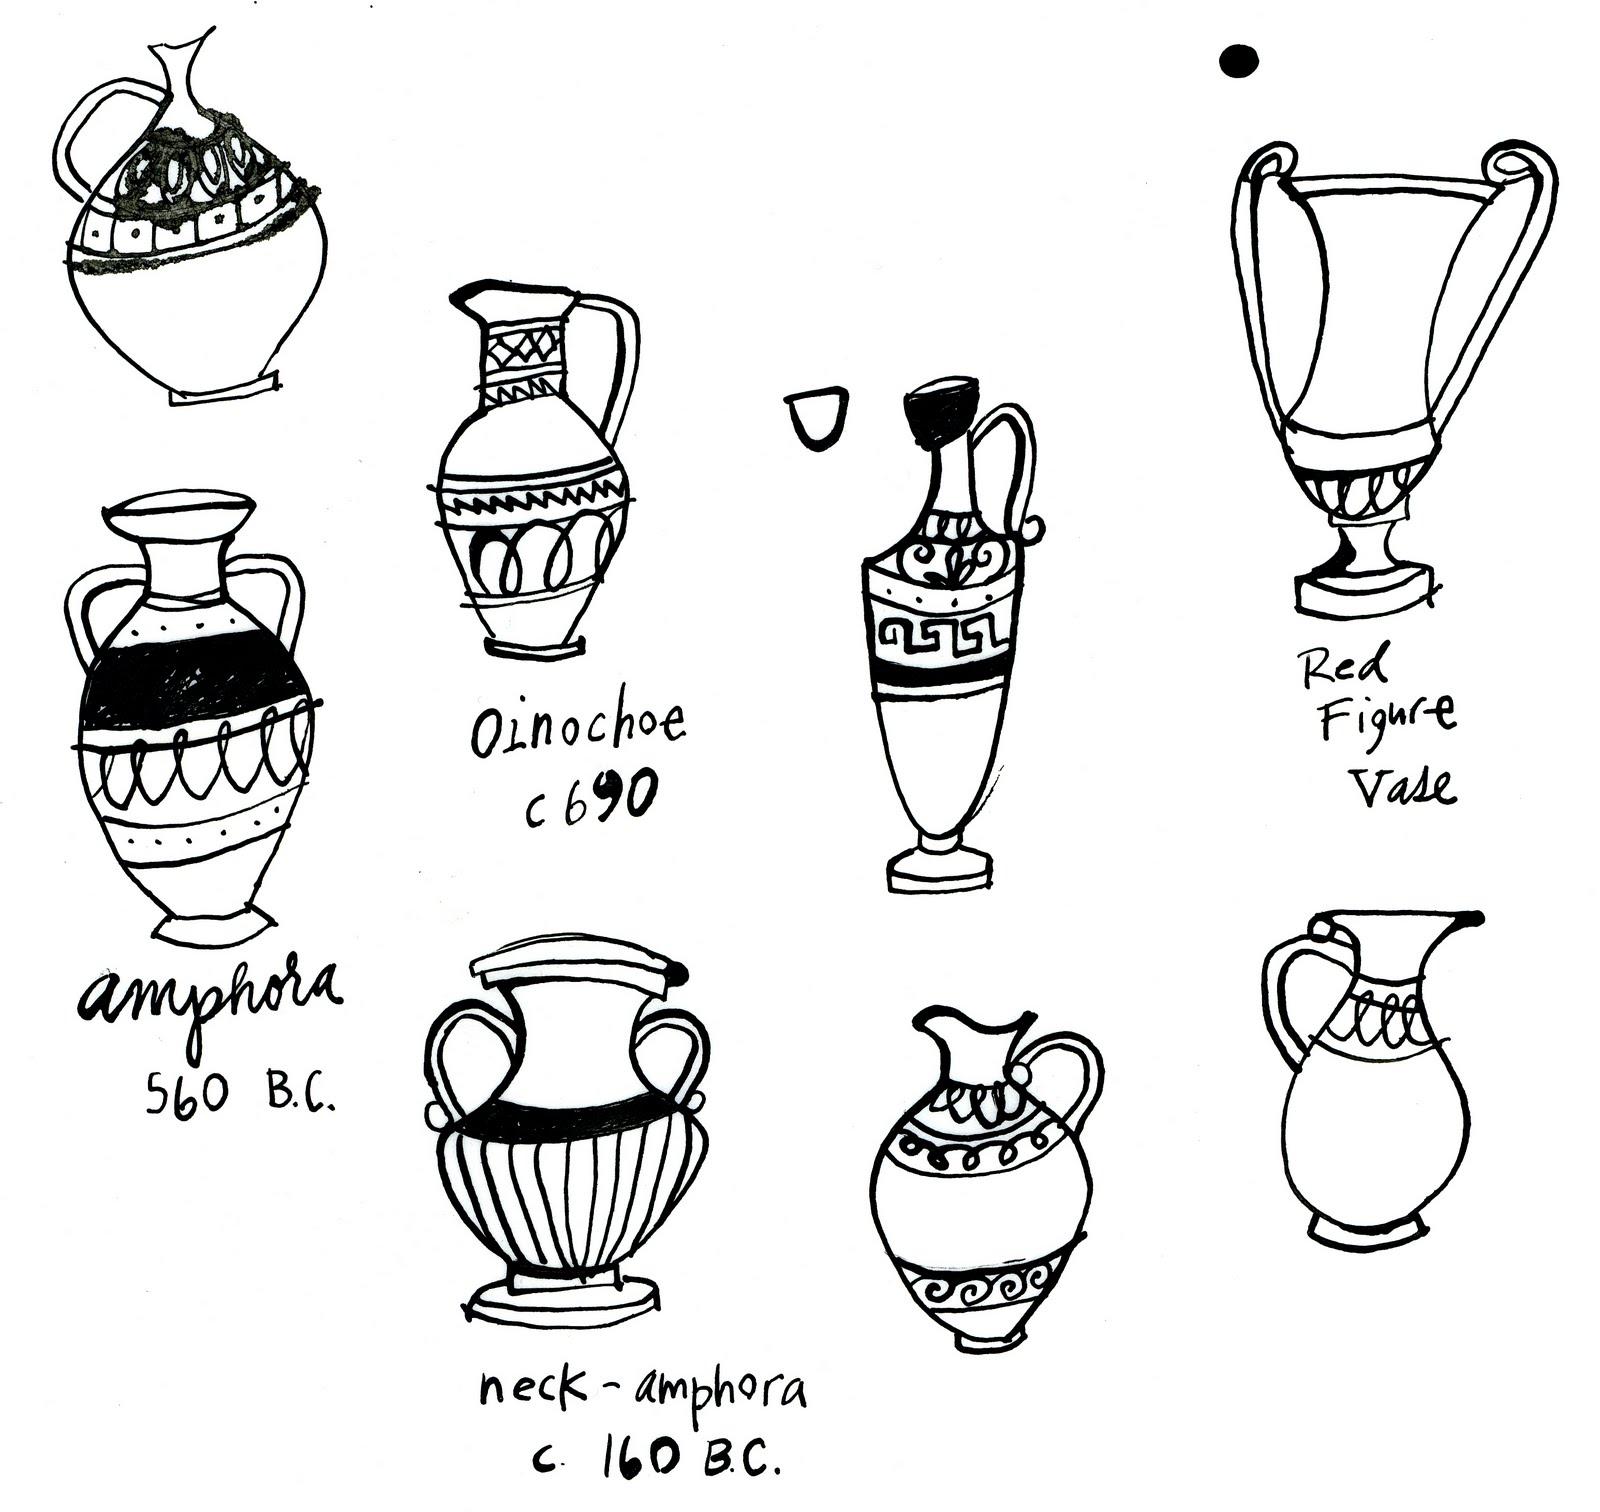 Alanna Cavanagh: New vase pattern